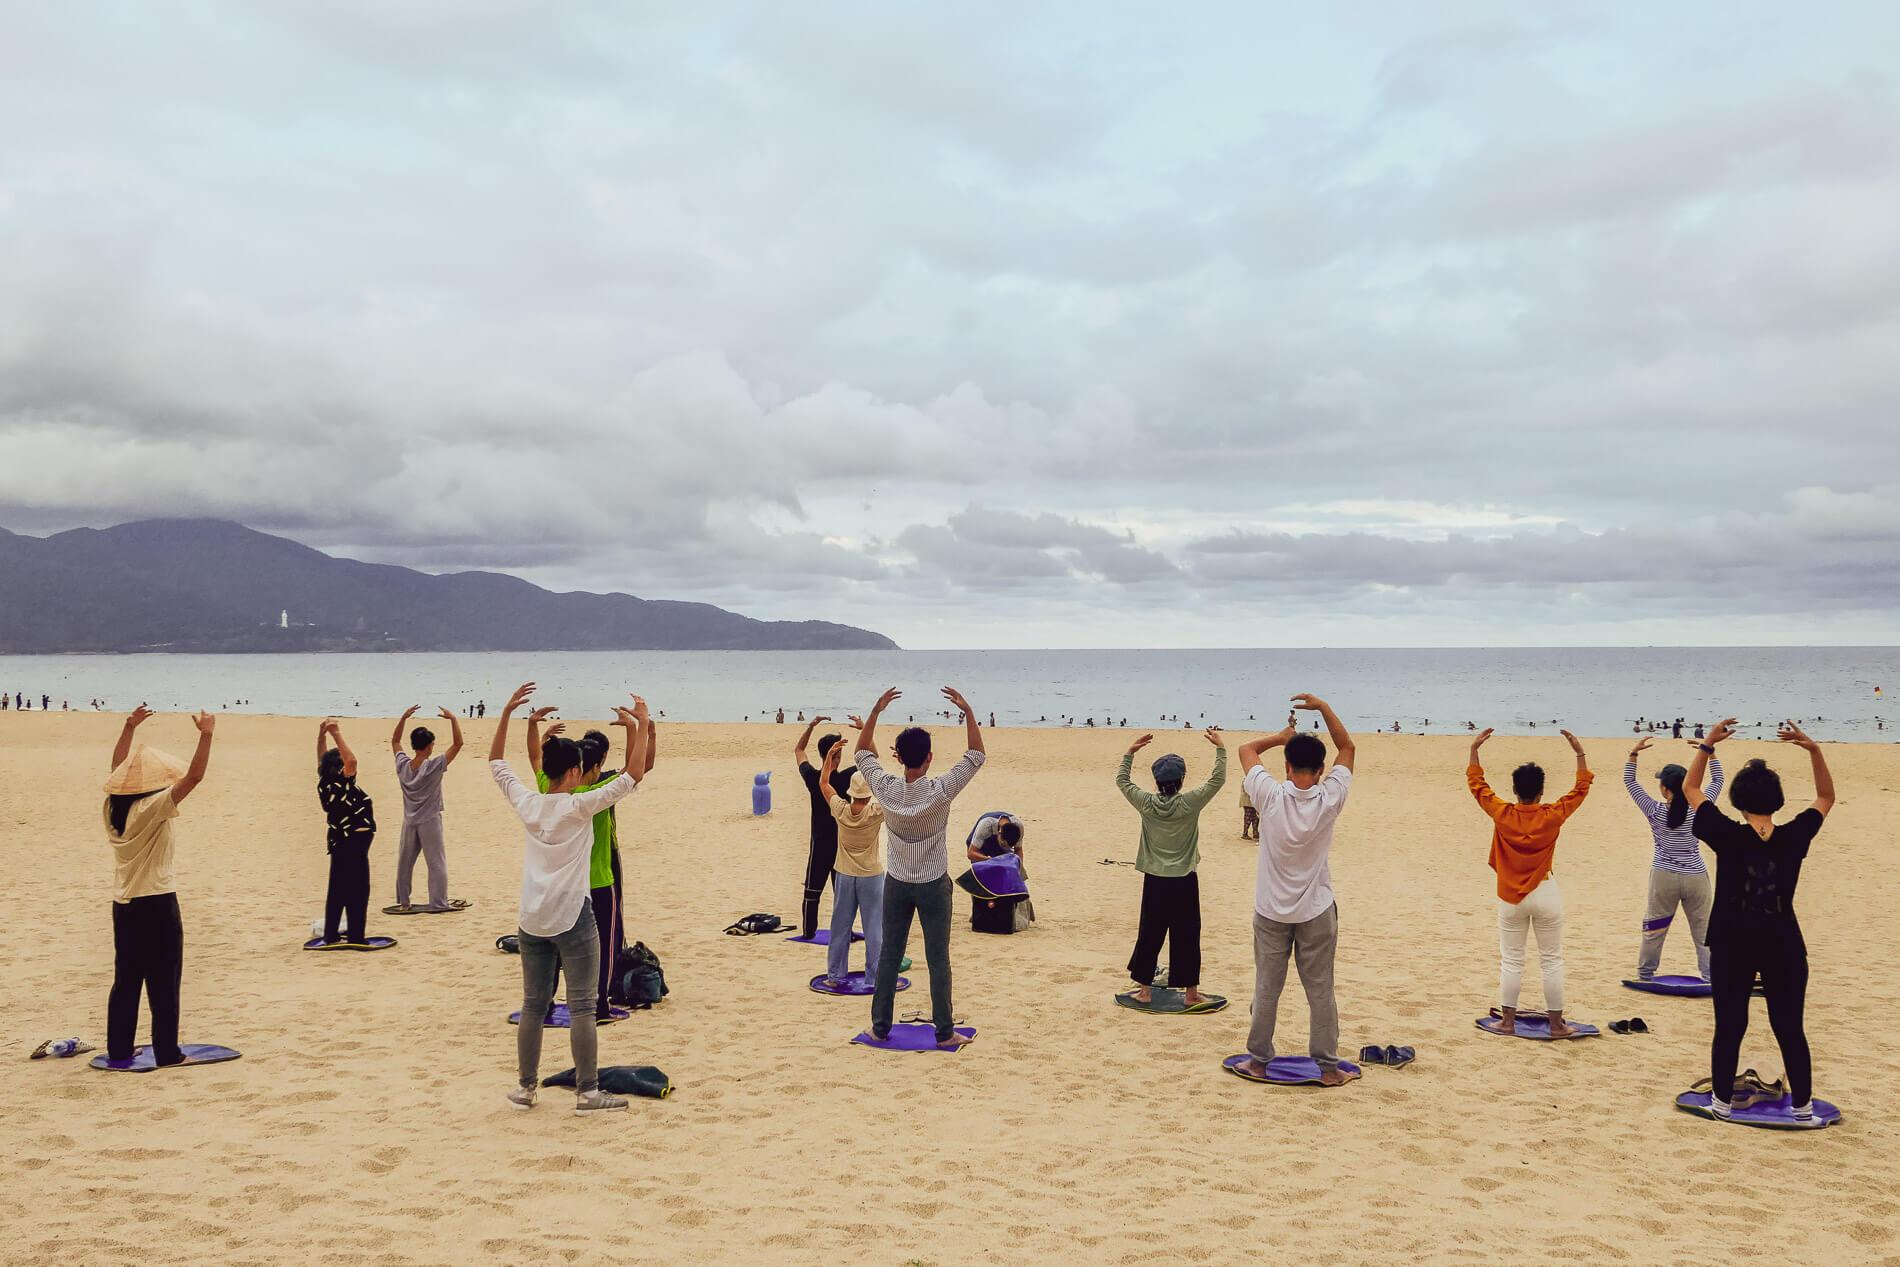 Yoga class on My Khe Beach in Da Nang